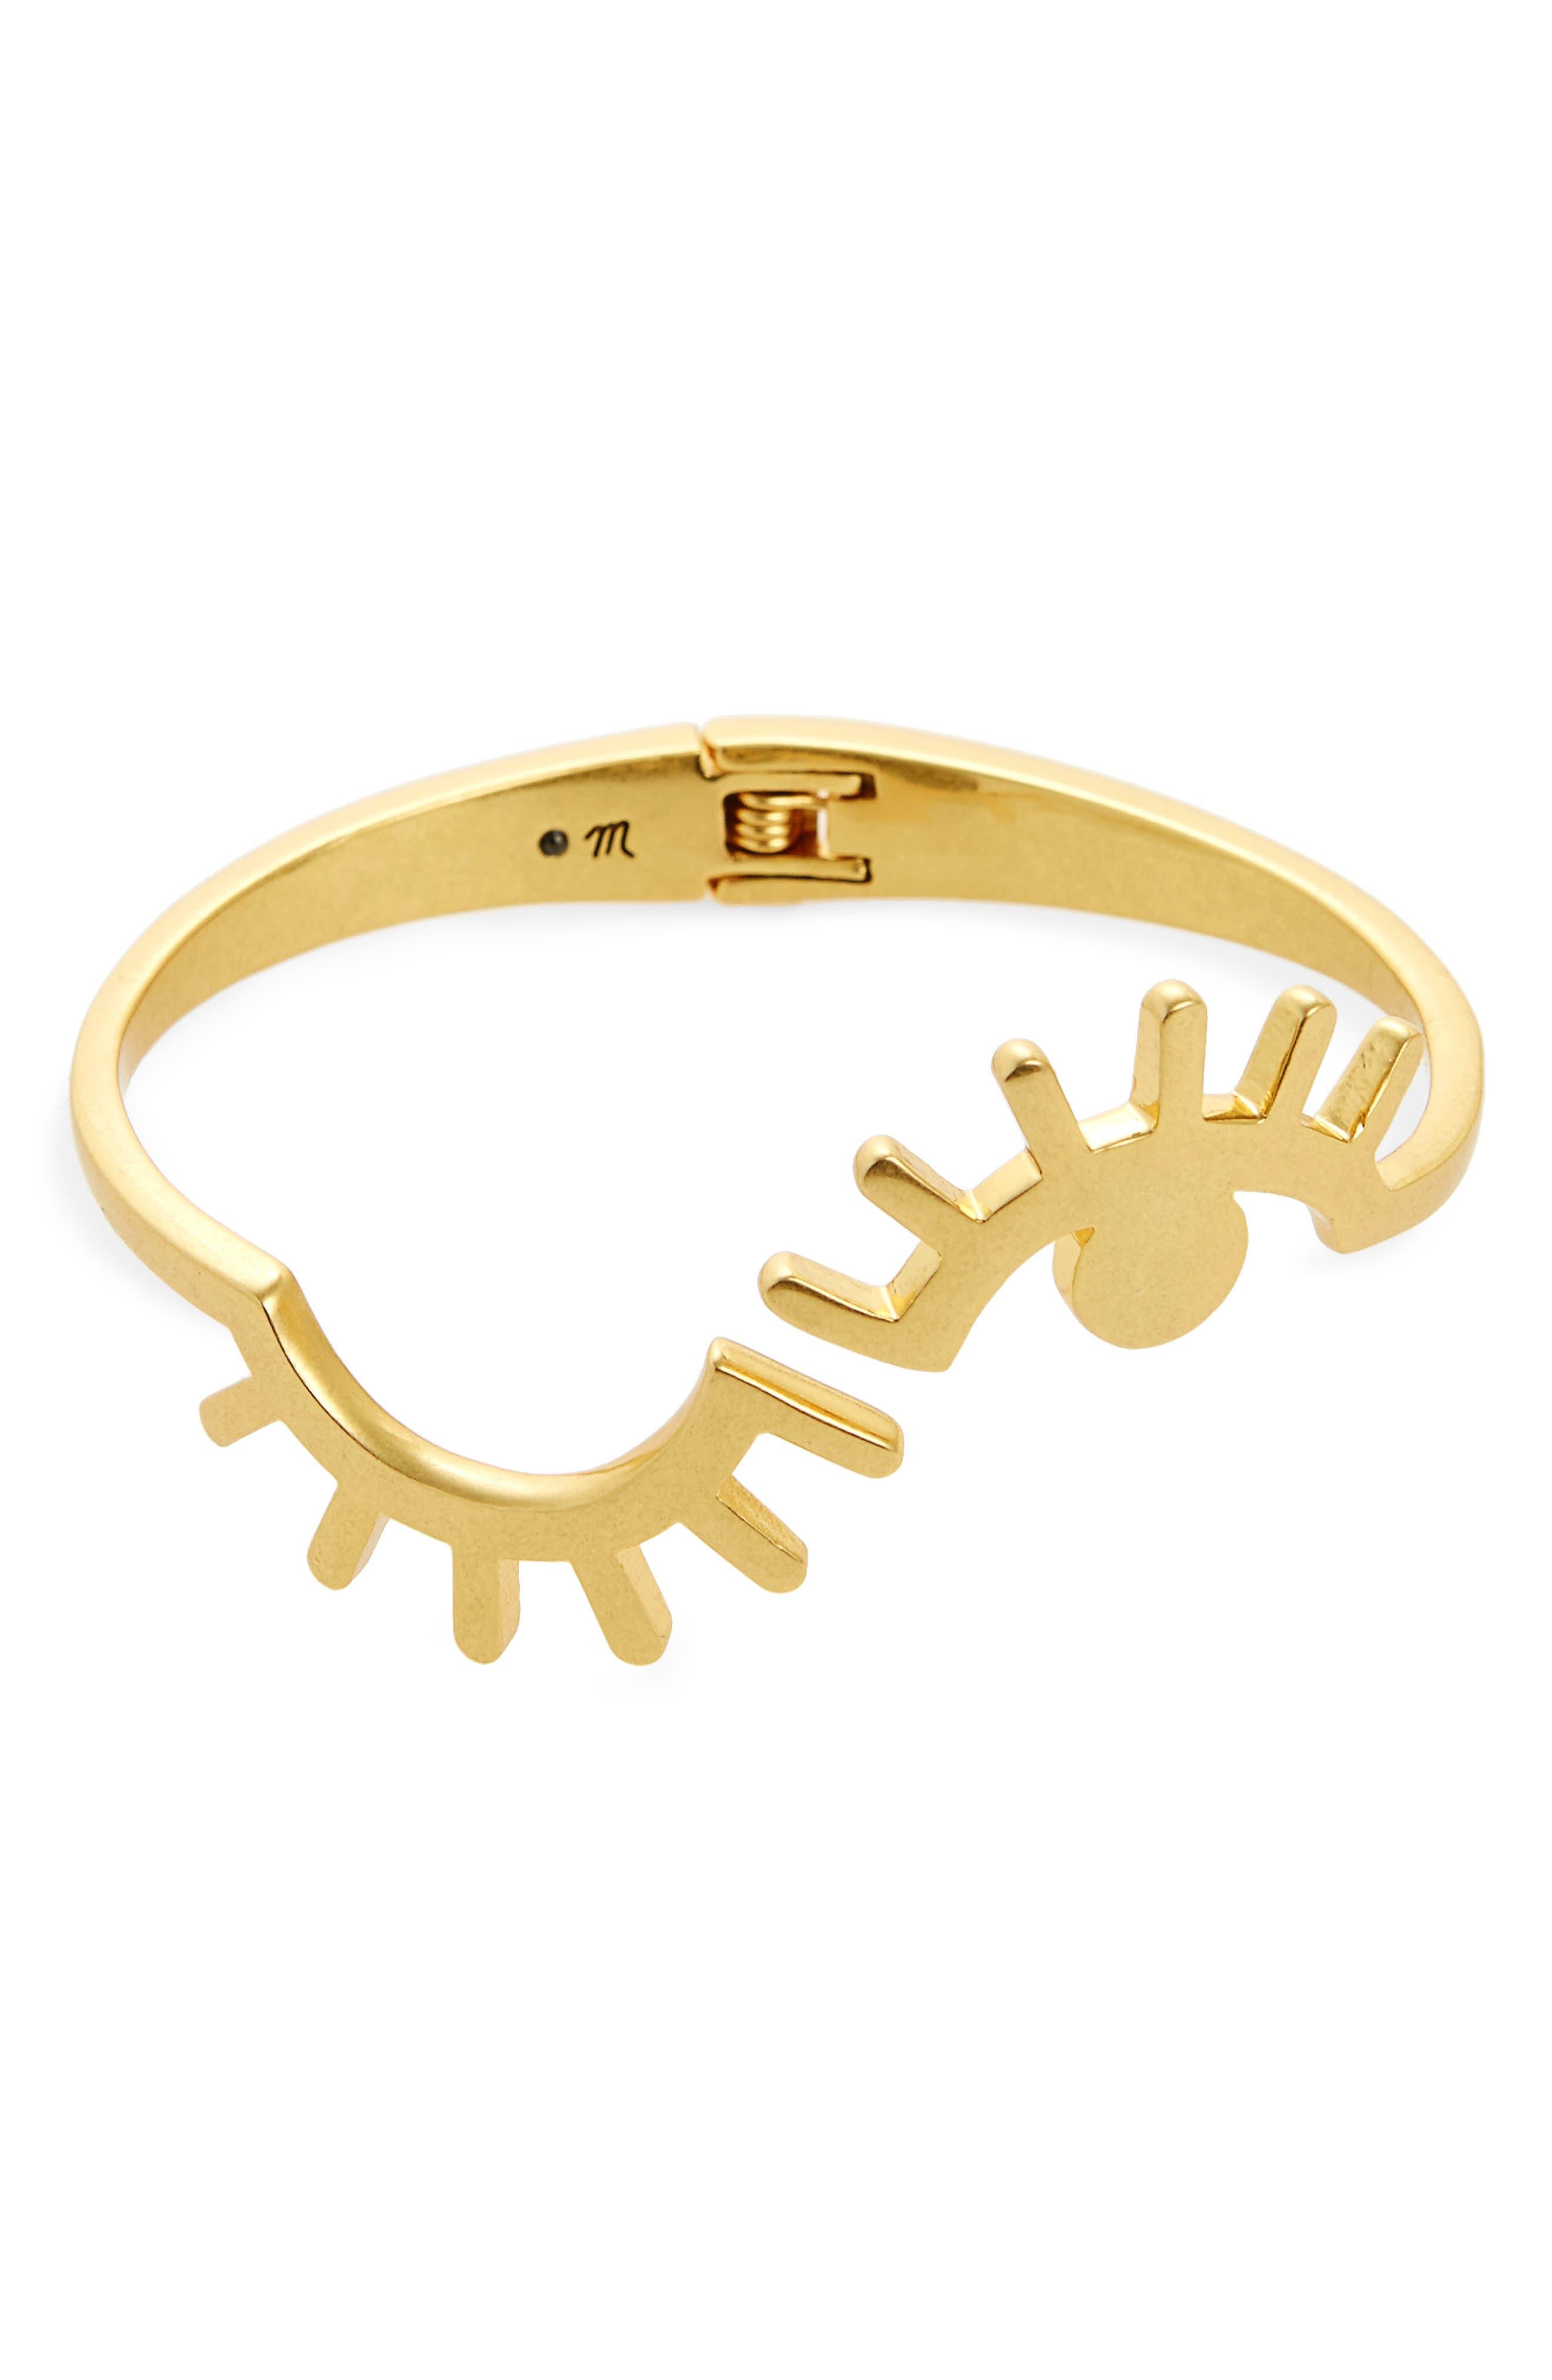 Madewell Looker Hinge Cuff Bracelet